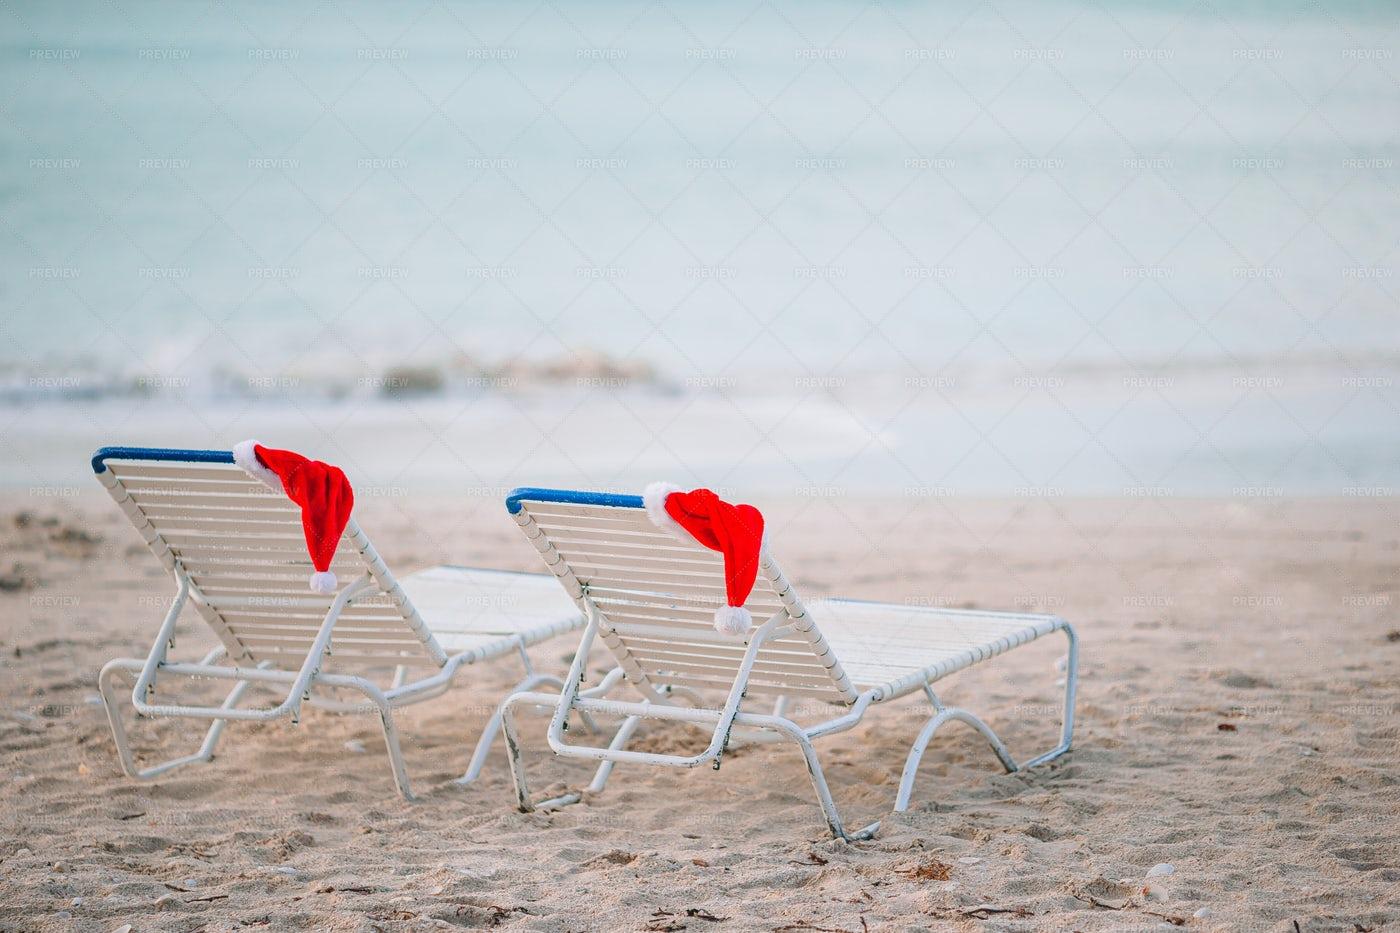 Santa Hats On Lounge Chairs: Stock Photos